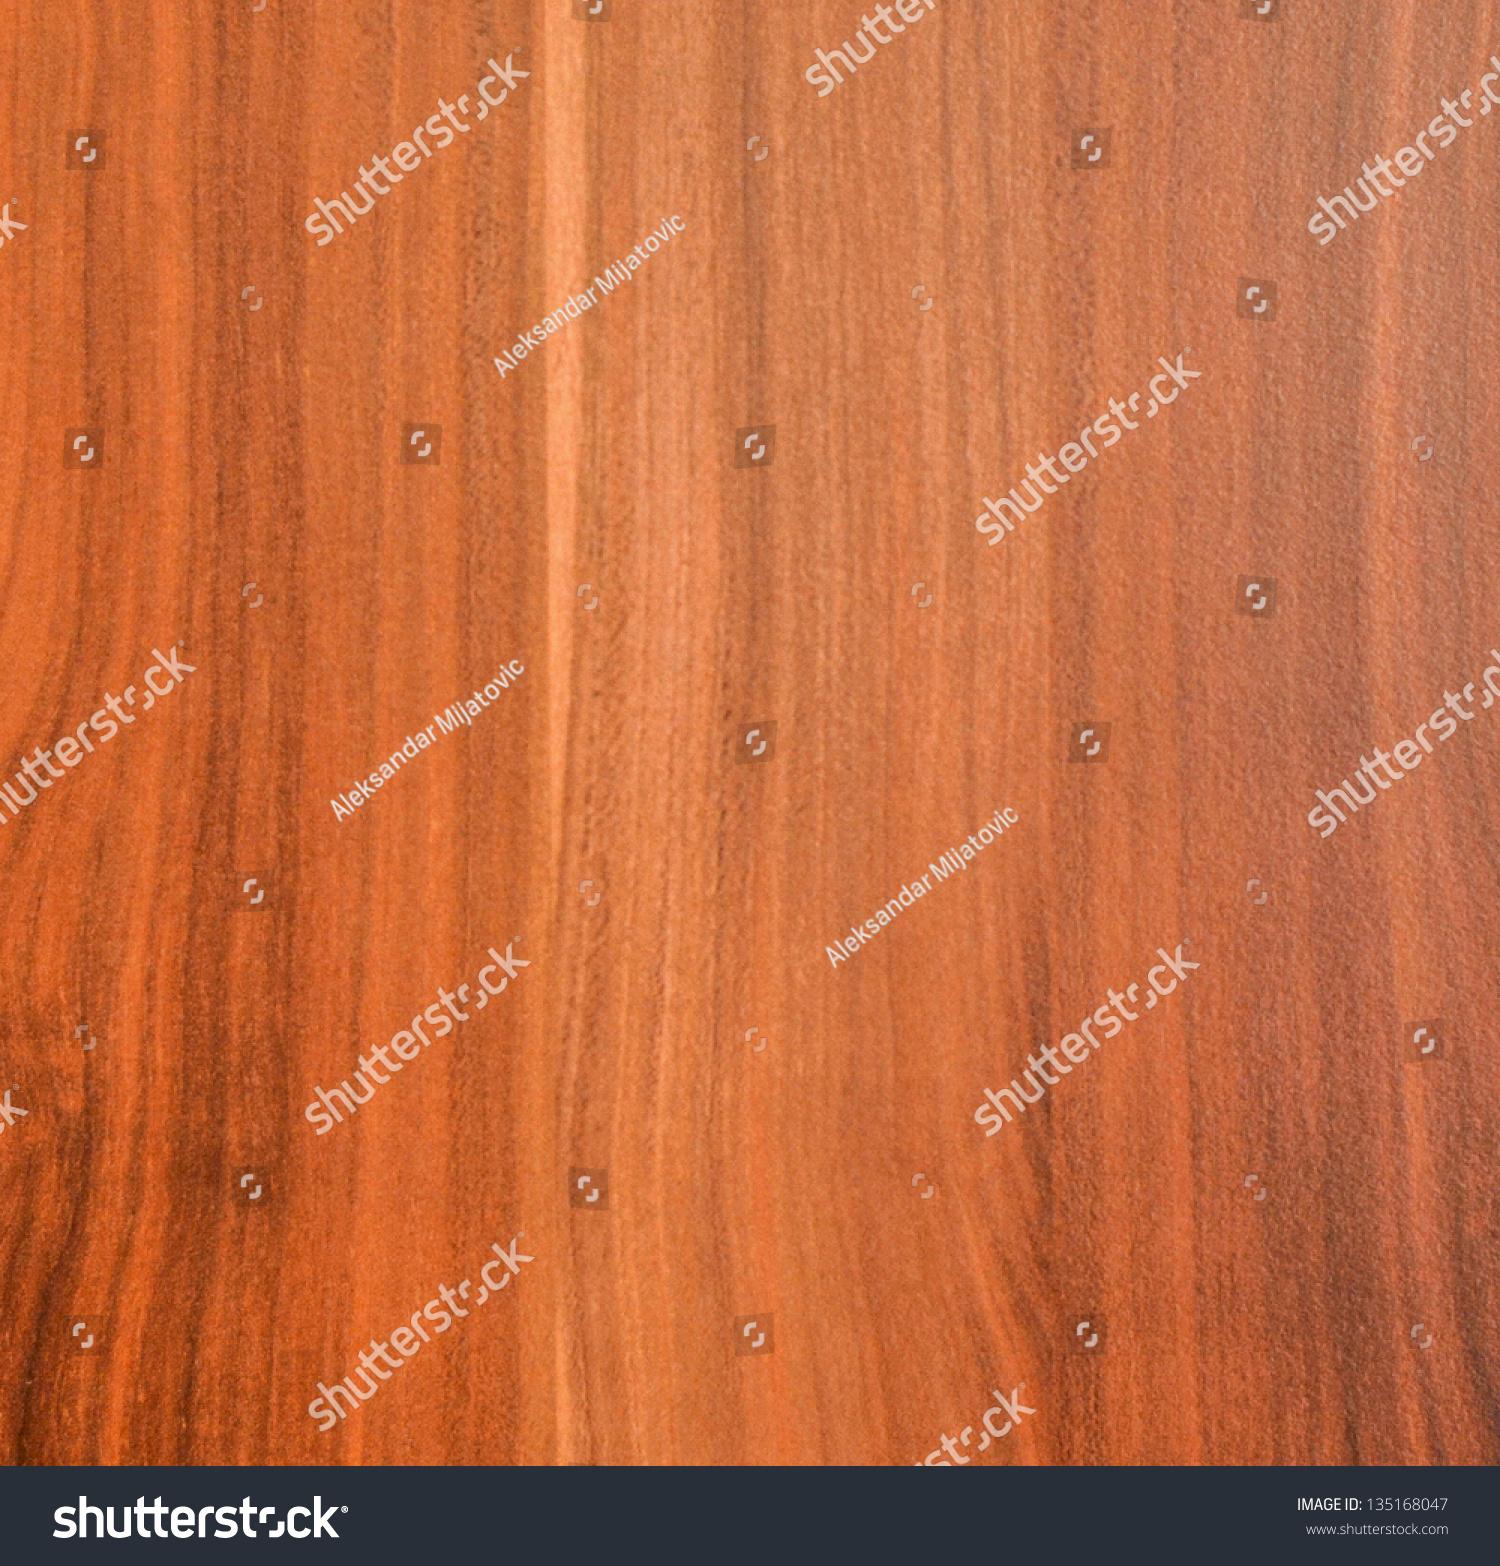 Cherry wood flooring texture Dark Bamboo Flooring Cherry Wood Flooring Board Seamless Texture Builddirect Cherry Wood Flooring Board Seamless Texture Stock Photo edit Now